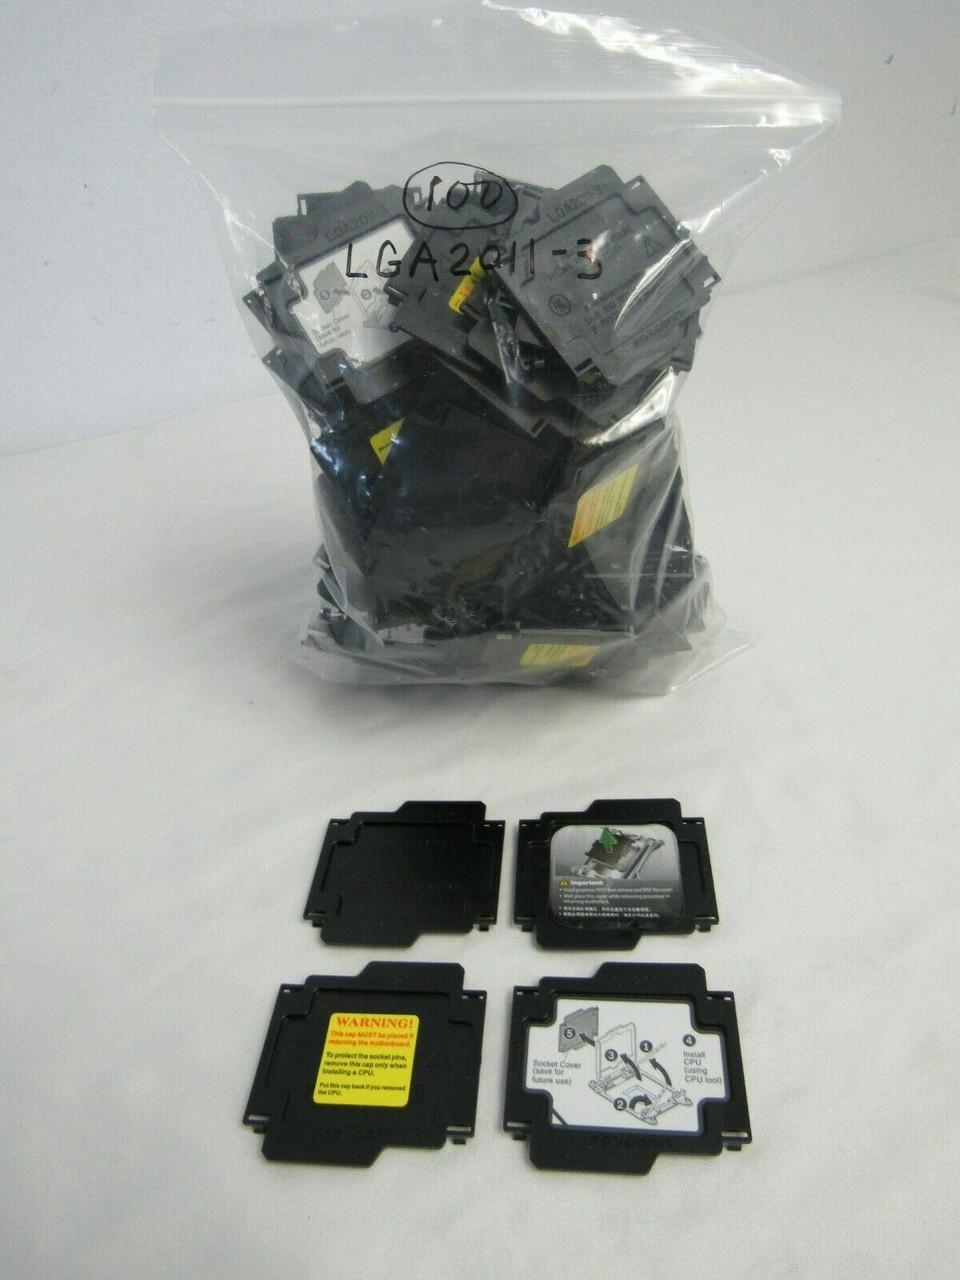 Lotes Intel LGA2011 CPU Socket Protector Covers